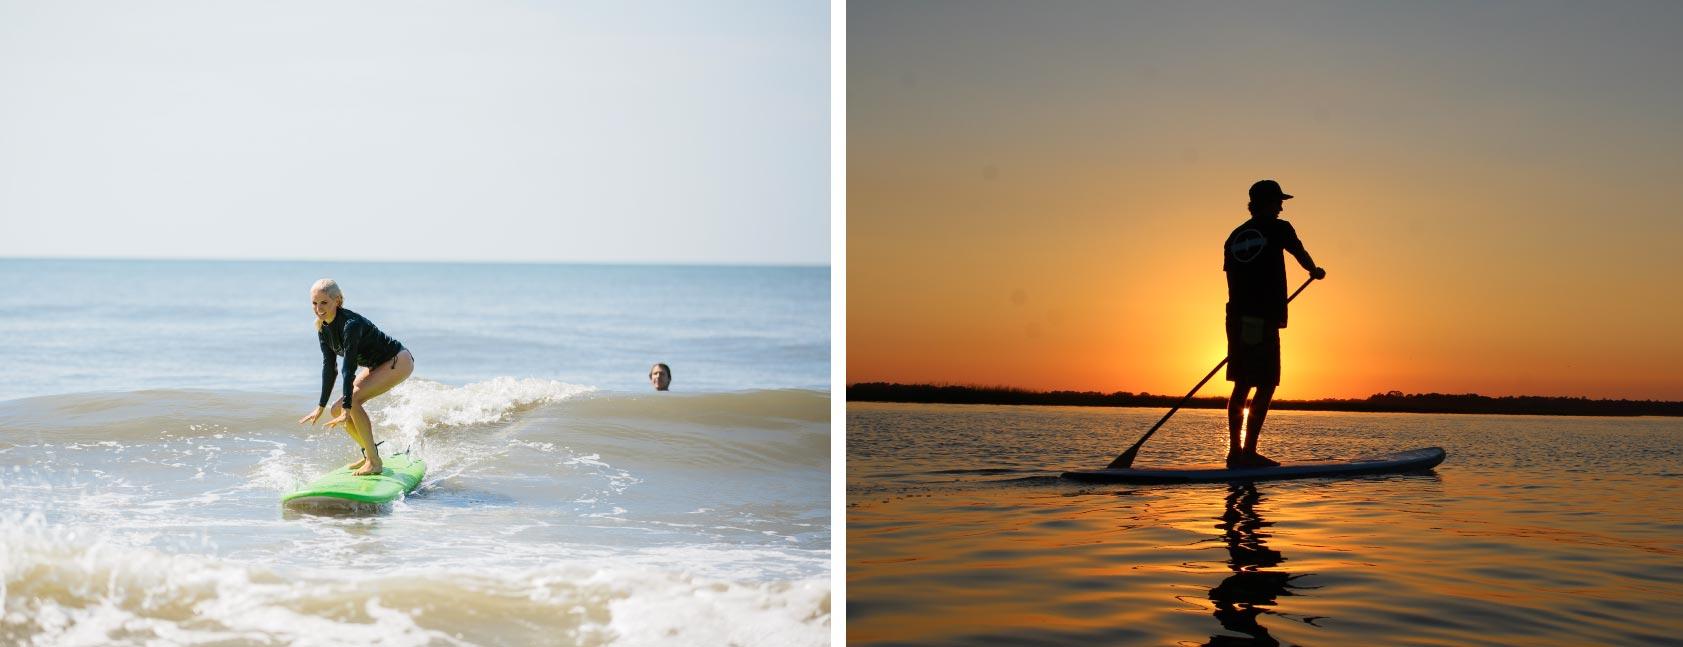 Charleston-Surf-Lessons-Paddle-Boarding-Tours.jpg